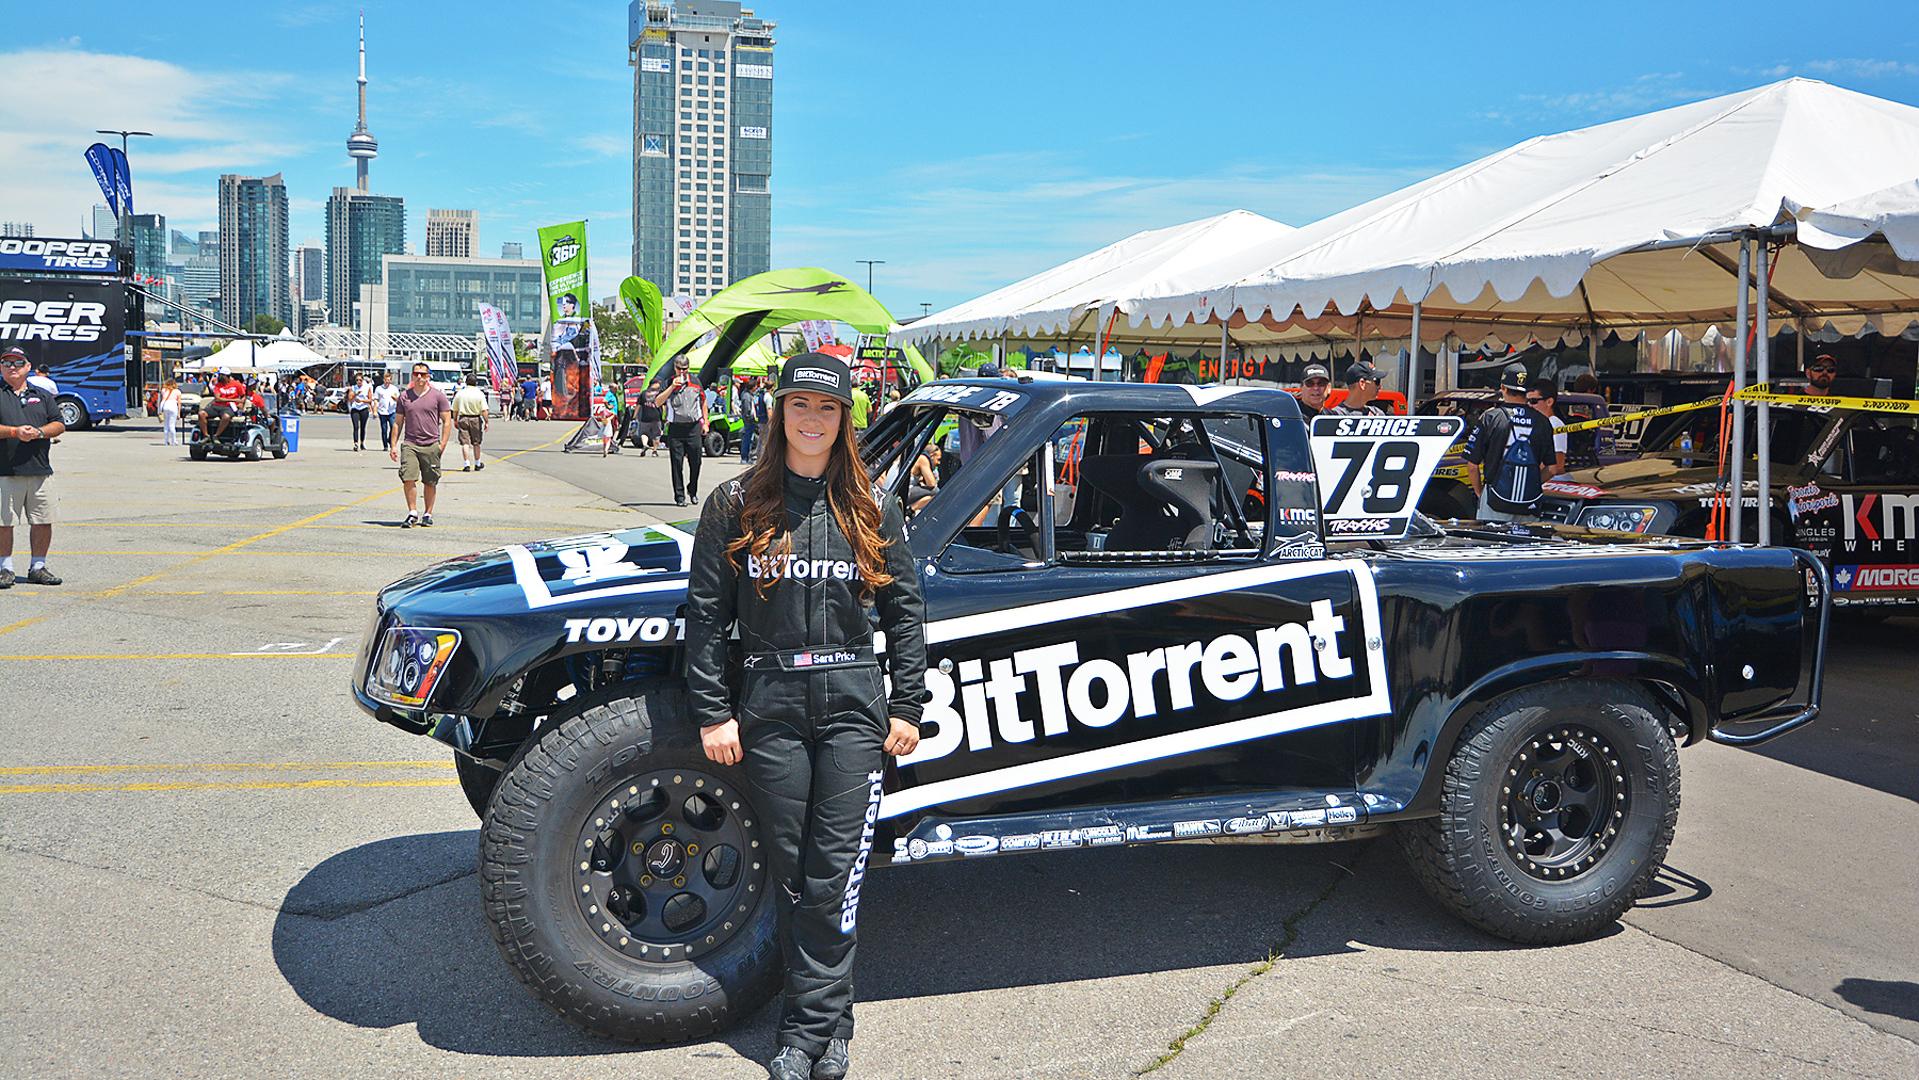 Honda Indy Toronto >> BitTorrent-sponsored female racer rocks Stadium Super Trucks in Toronto